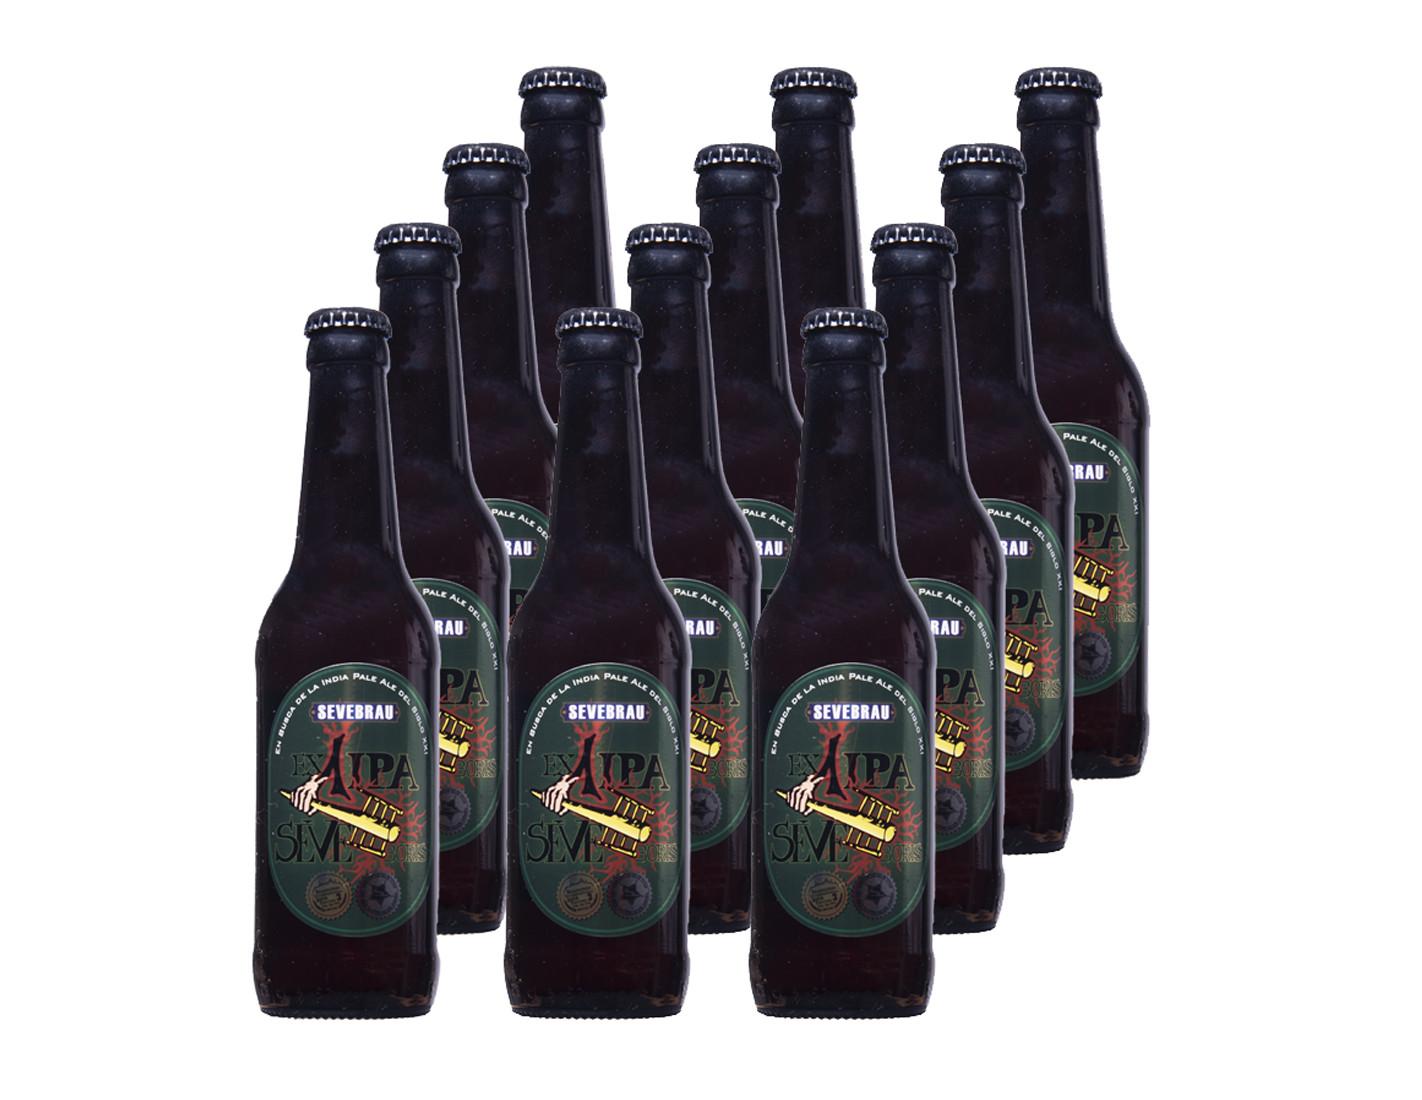 Lote 12 cervezas Ex 1 Ipa Sevebrau